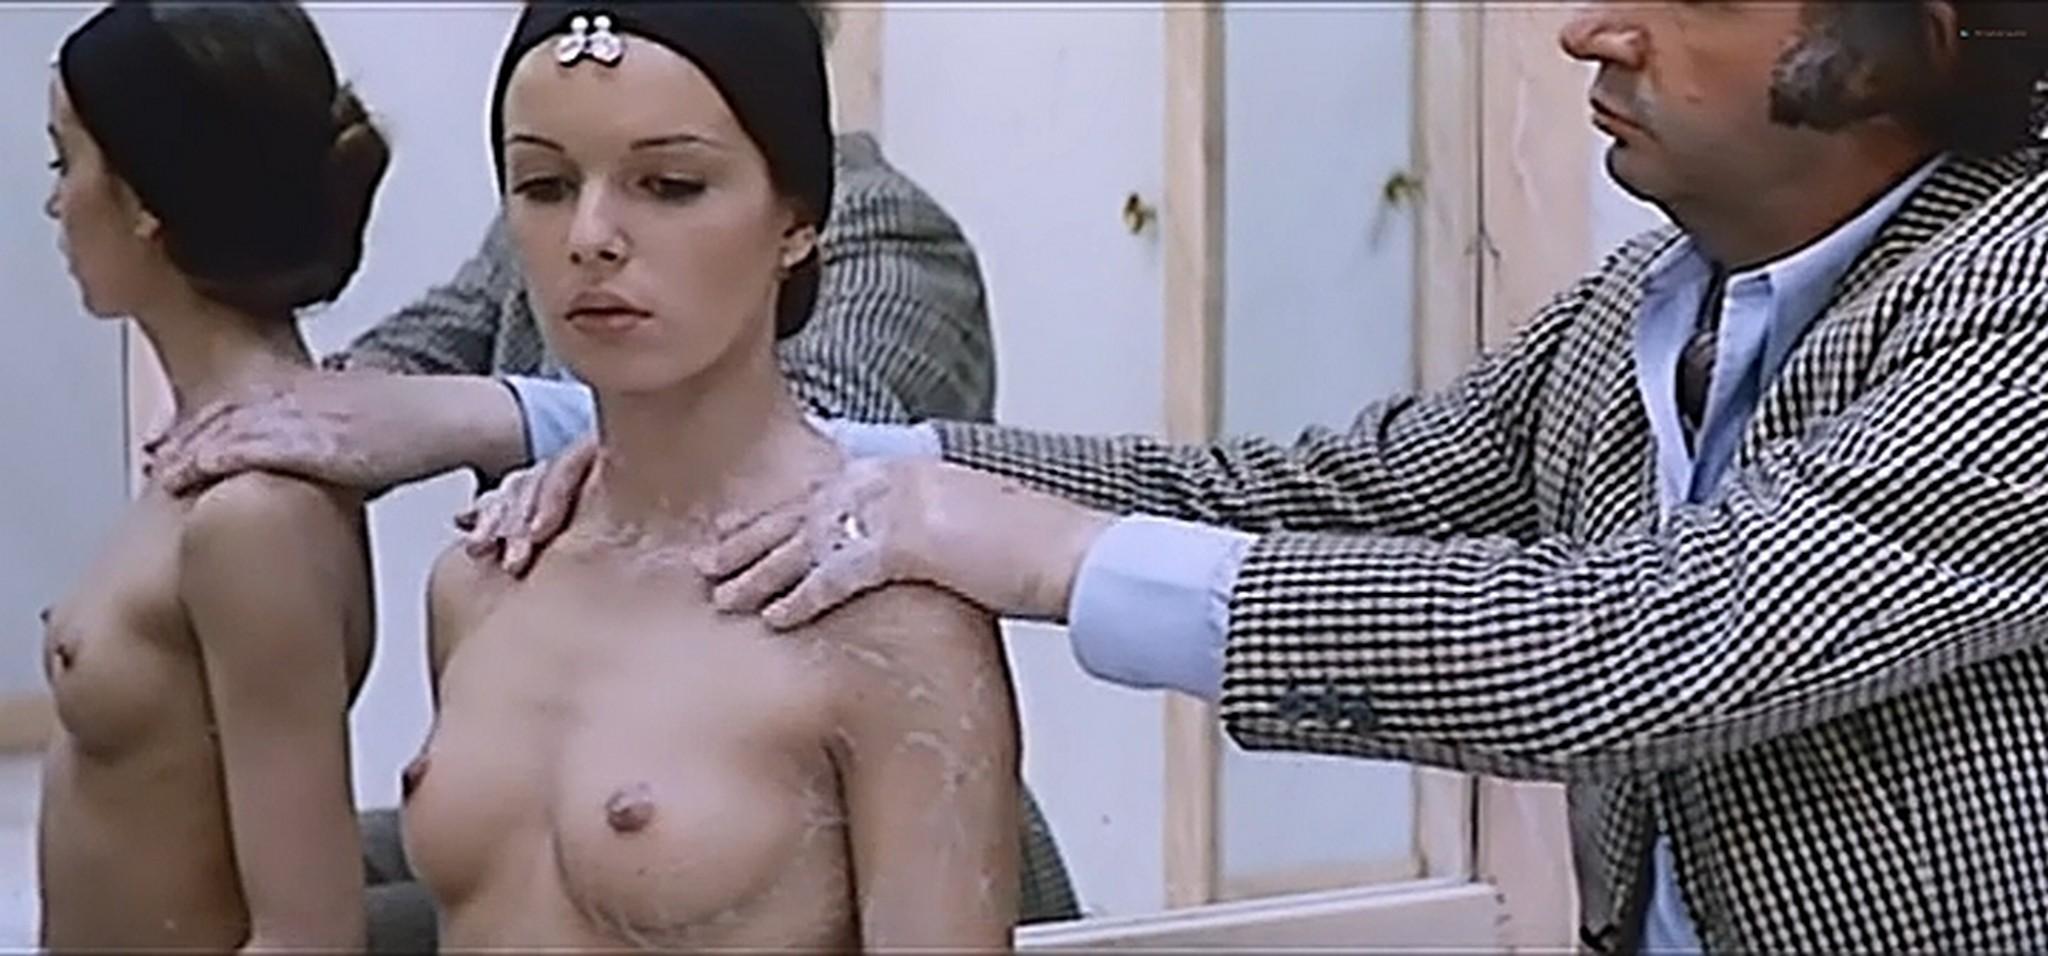 Anicee Alvina nude full frontal Sylvia Kristel and others nude Le jeu avec le feu FR 1975 DVDrip 11